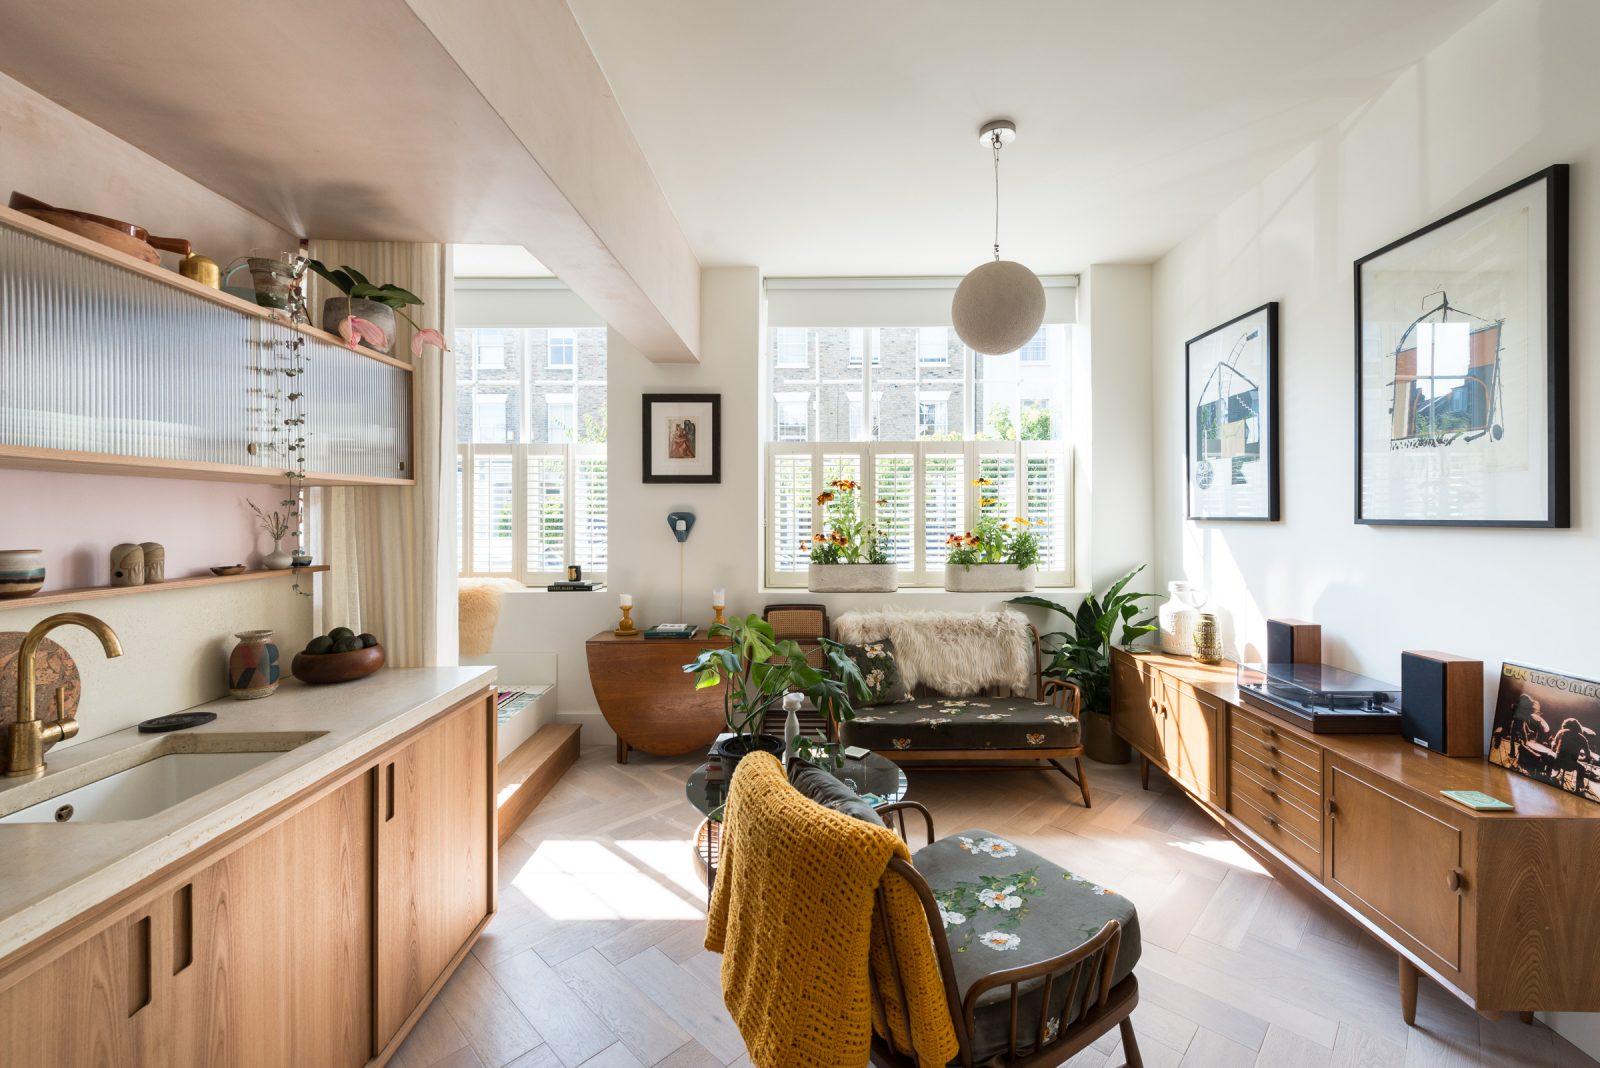 Wilton Way, The Modern House